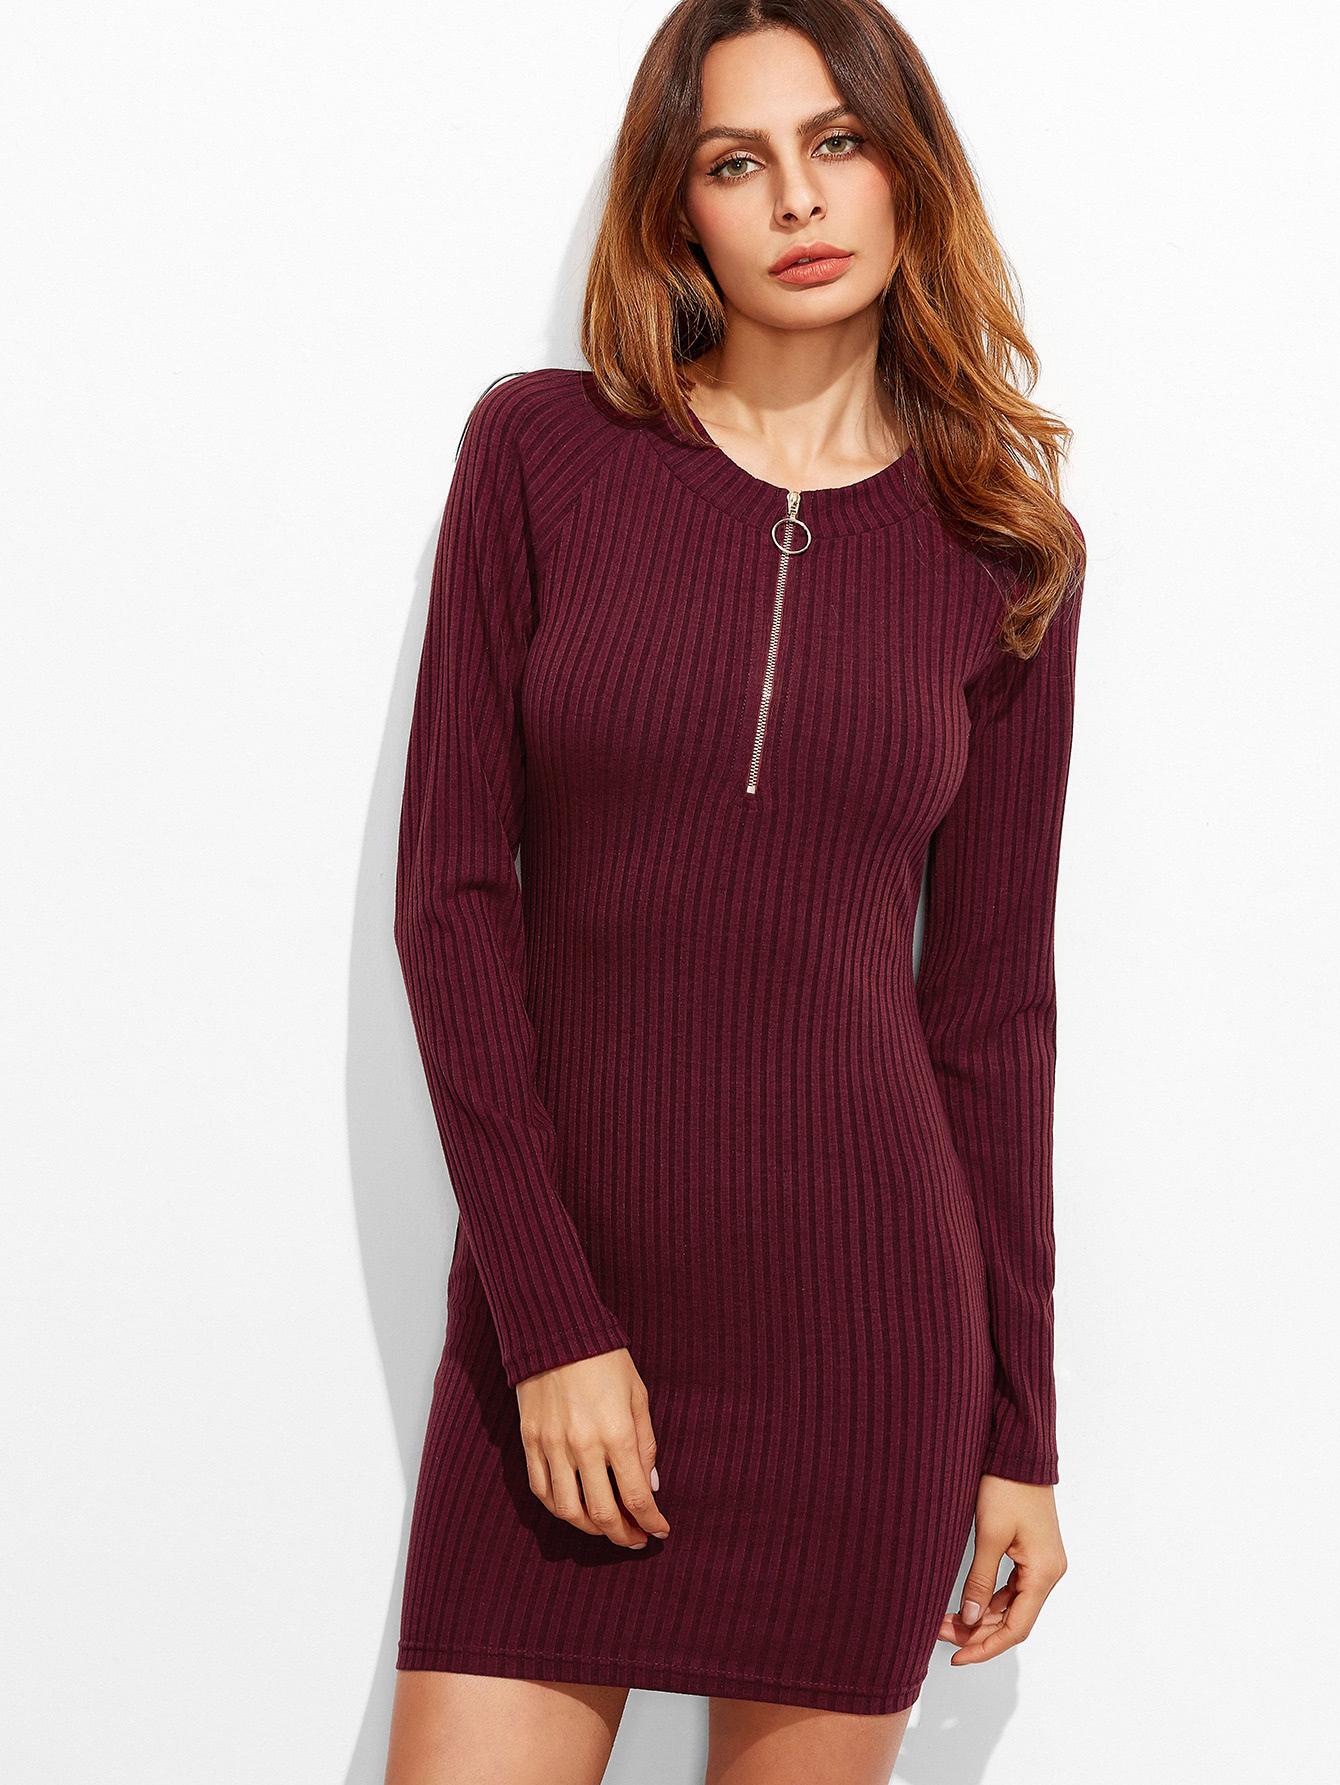 Burgundy Zip Neck Raglan Sleeve Ribbed Knit Bodycon Dress dress161206714